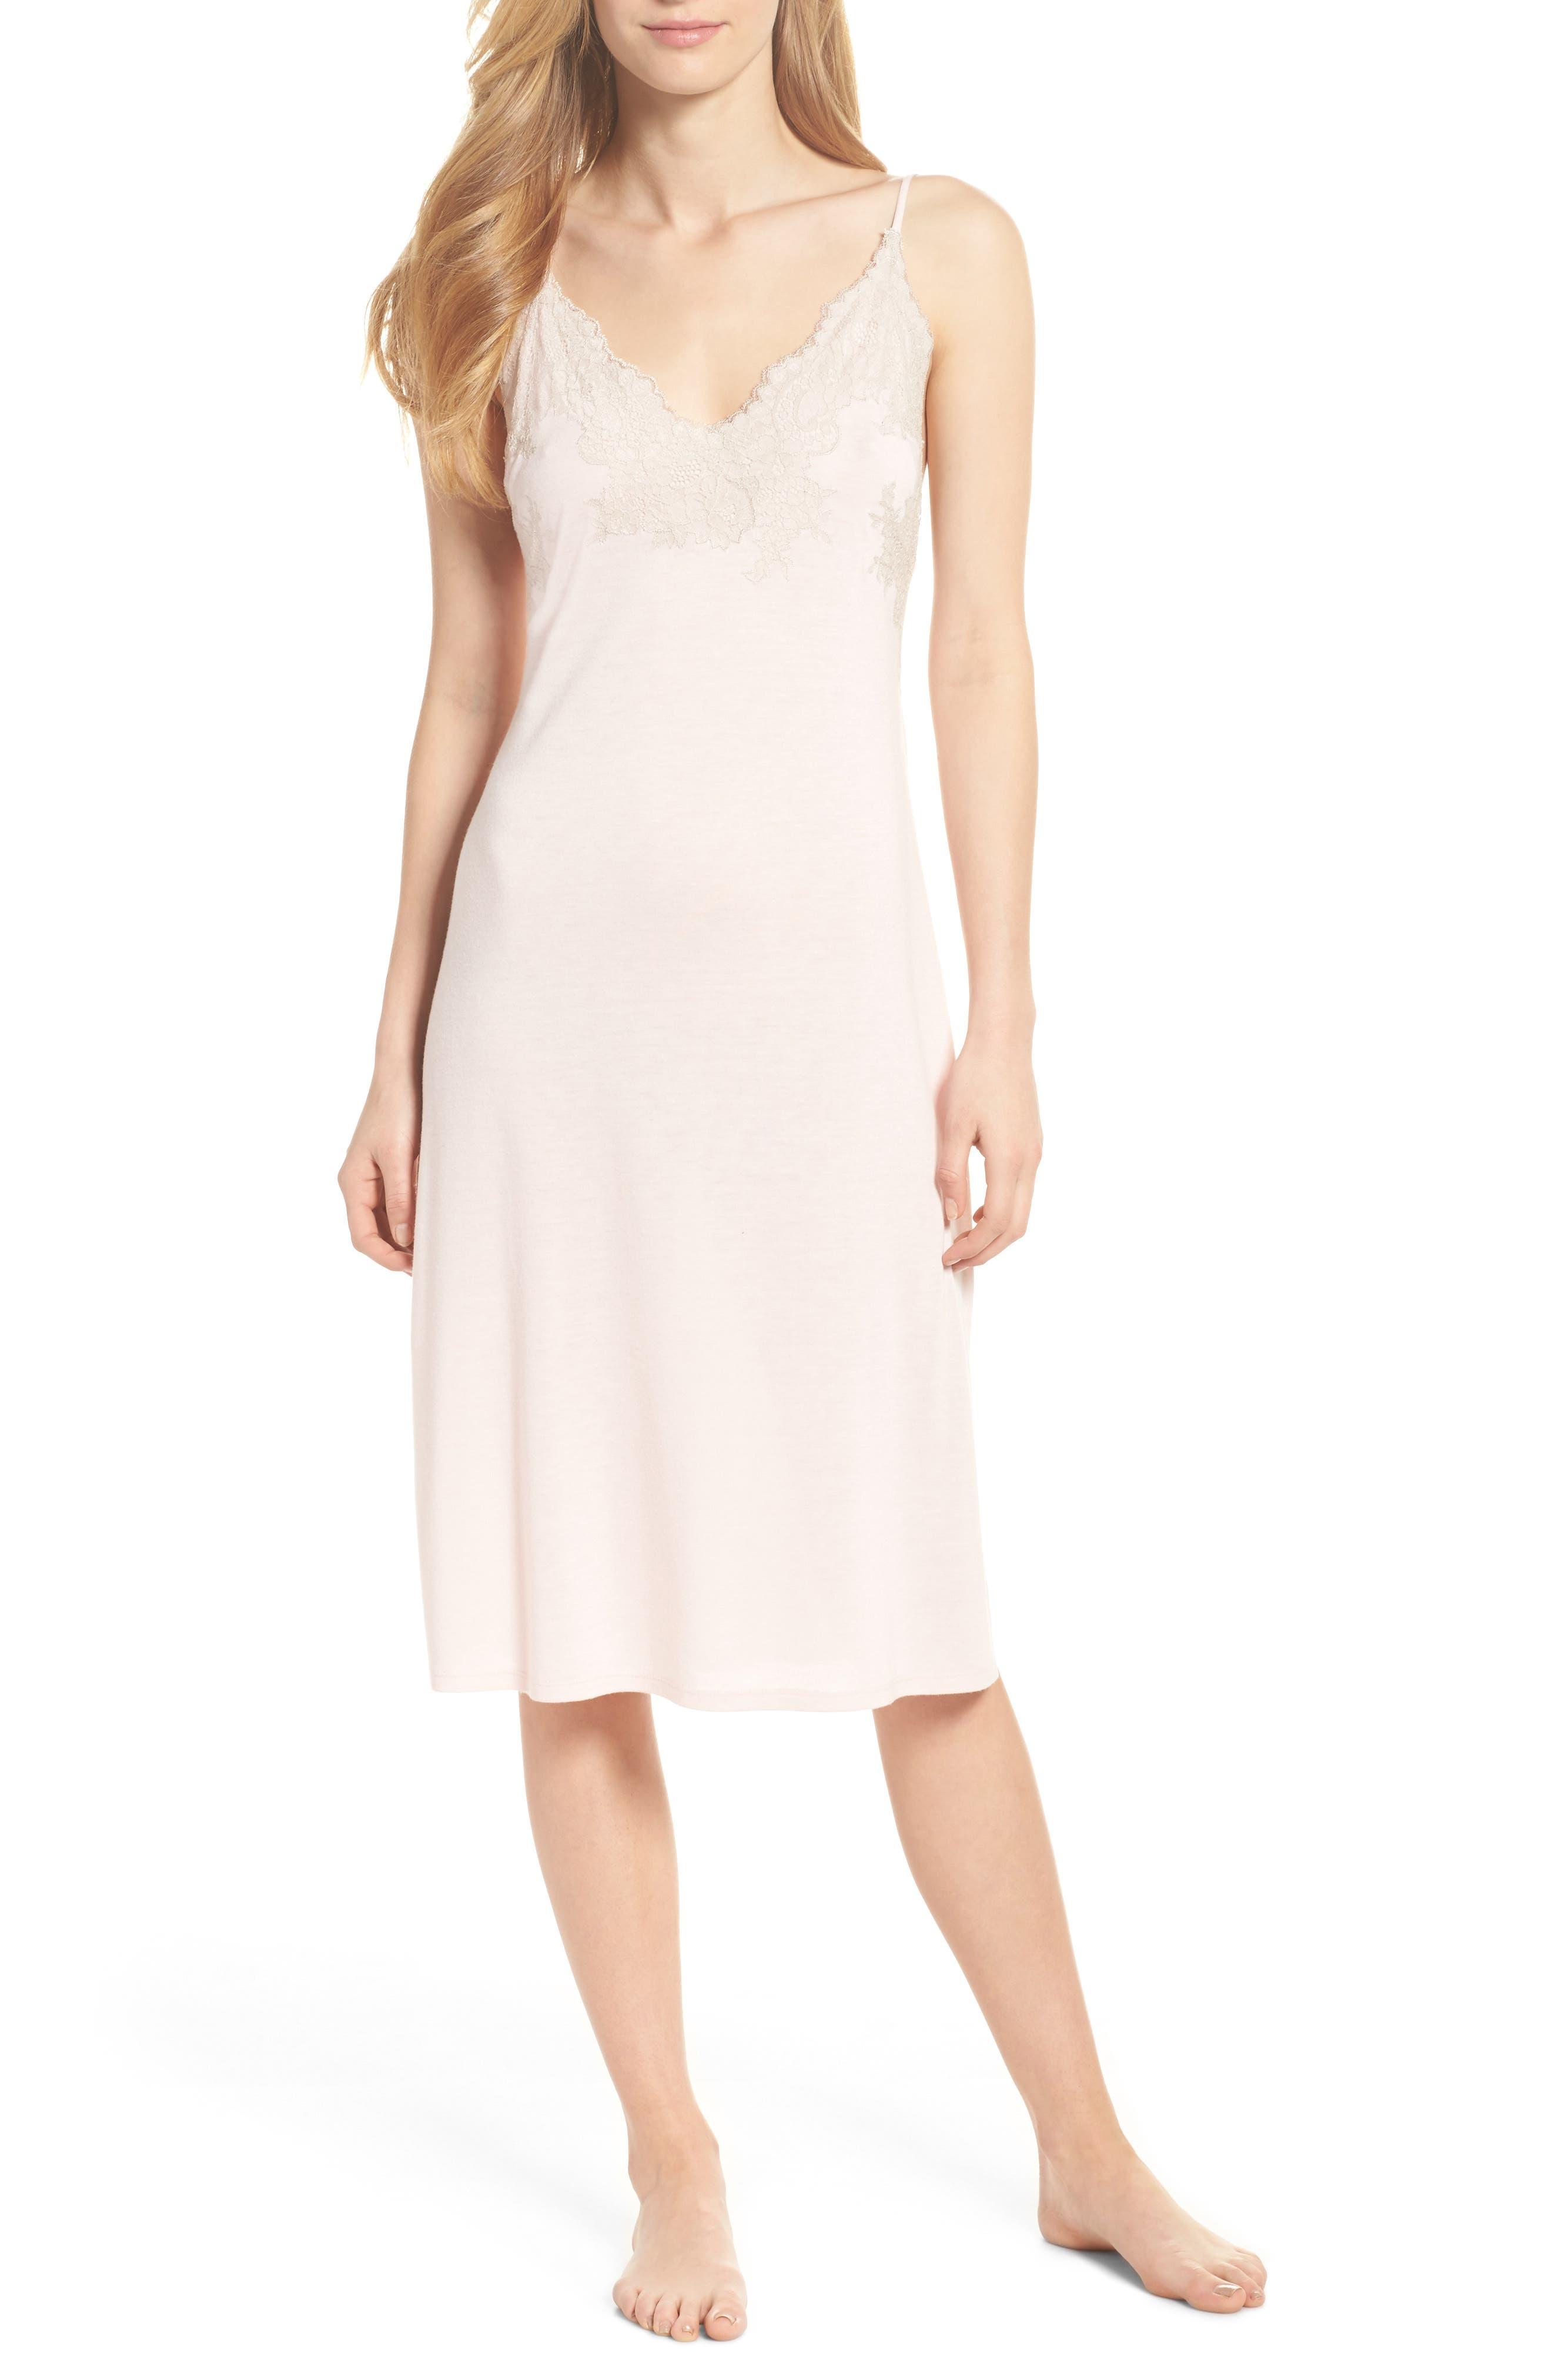 Luxe Shangri-La Nightgown,                             Main thumbnail 1, color,                             Blush Pink